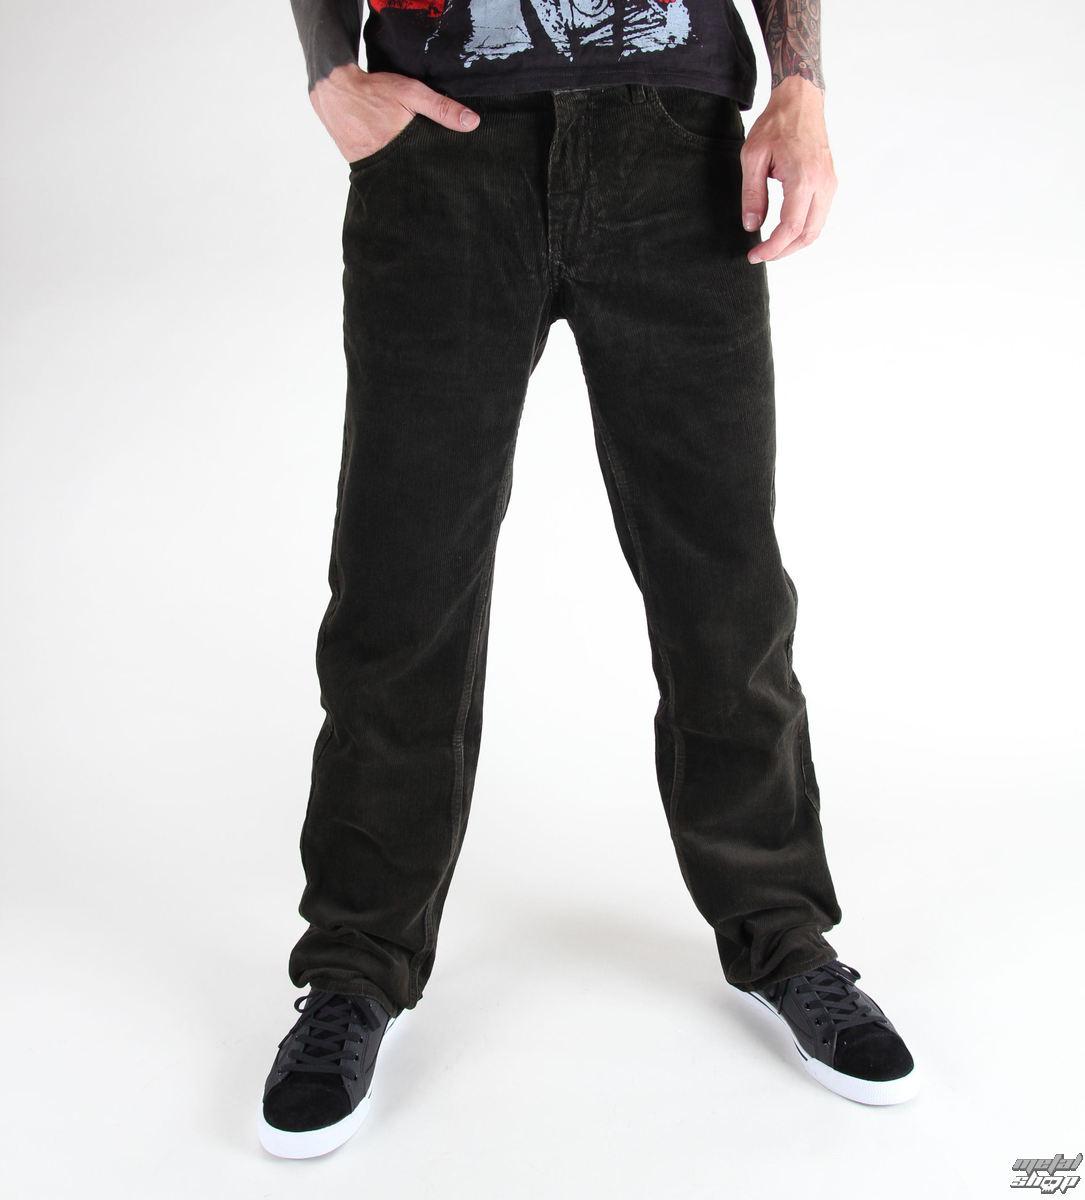 kalhoty pánské FUNSTORM - Haig - 05 khaki